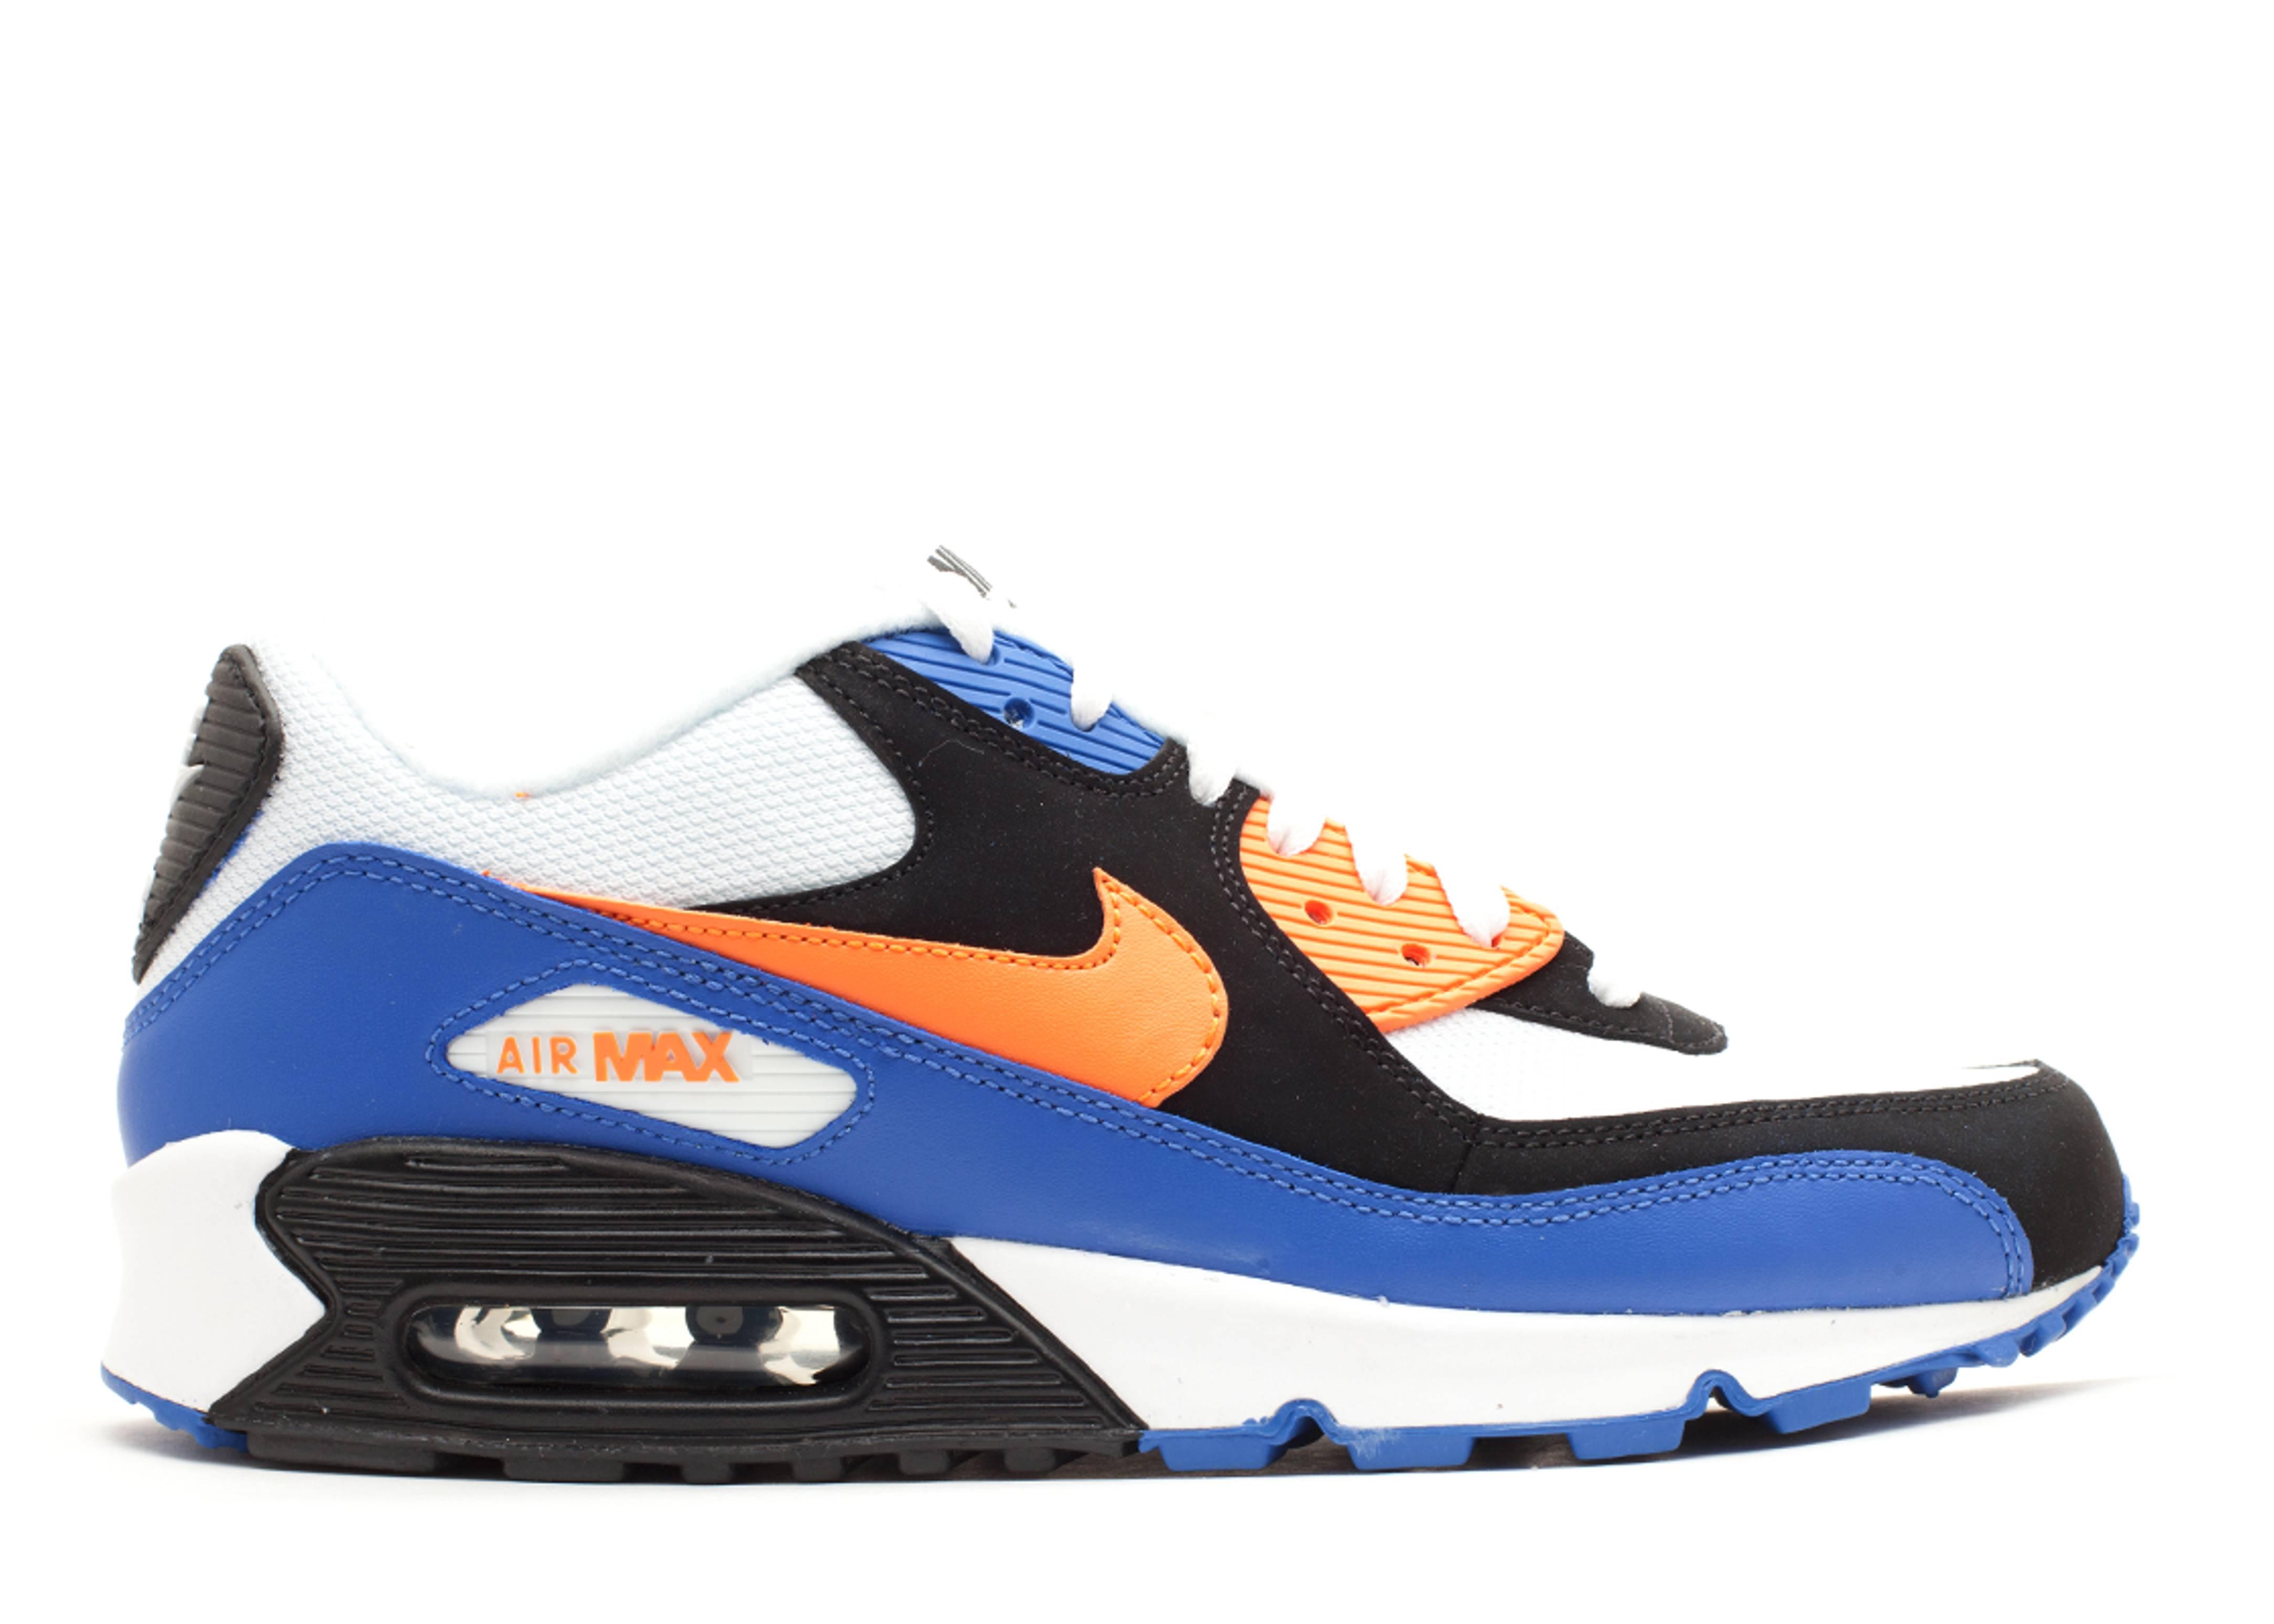 nike usa socks, 309299 028 90 White Blue,nike women air max